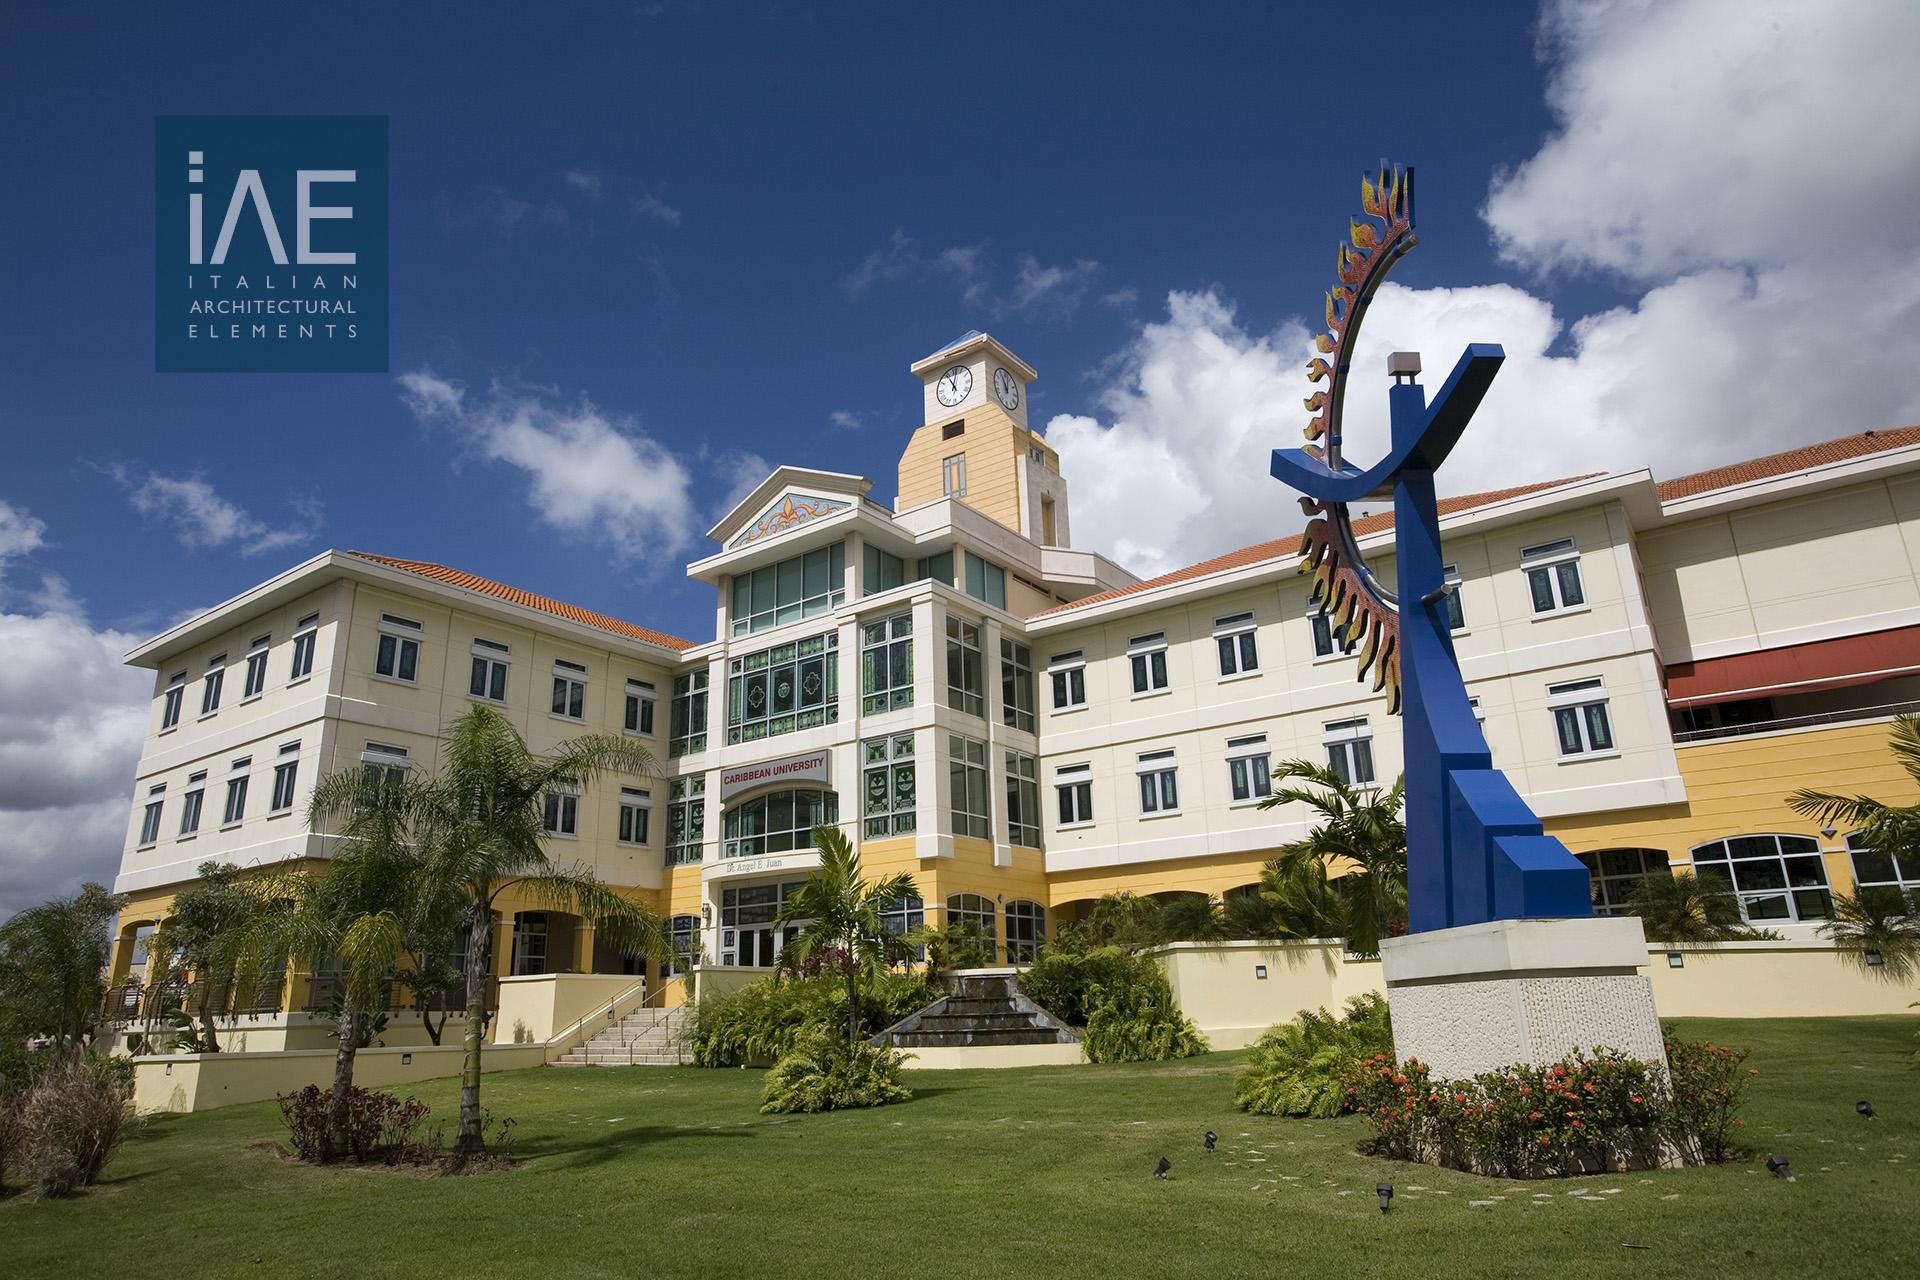 Caribbean University in Bayamón, Puerto Rico